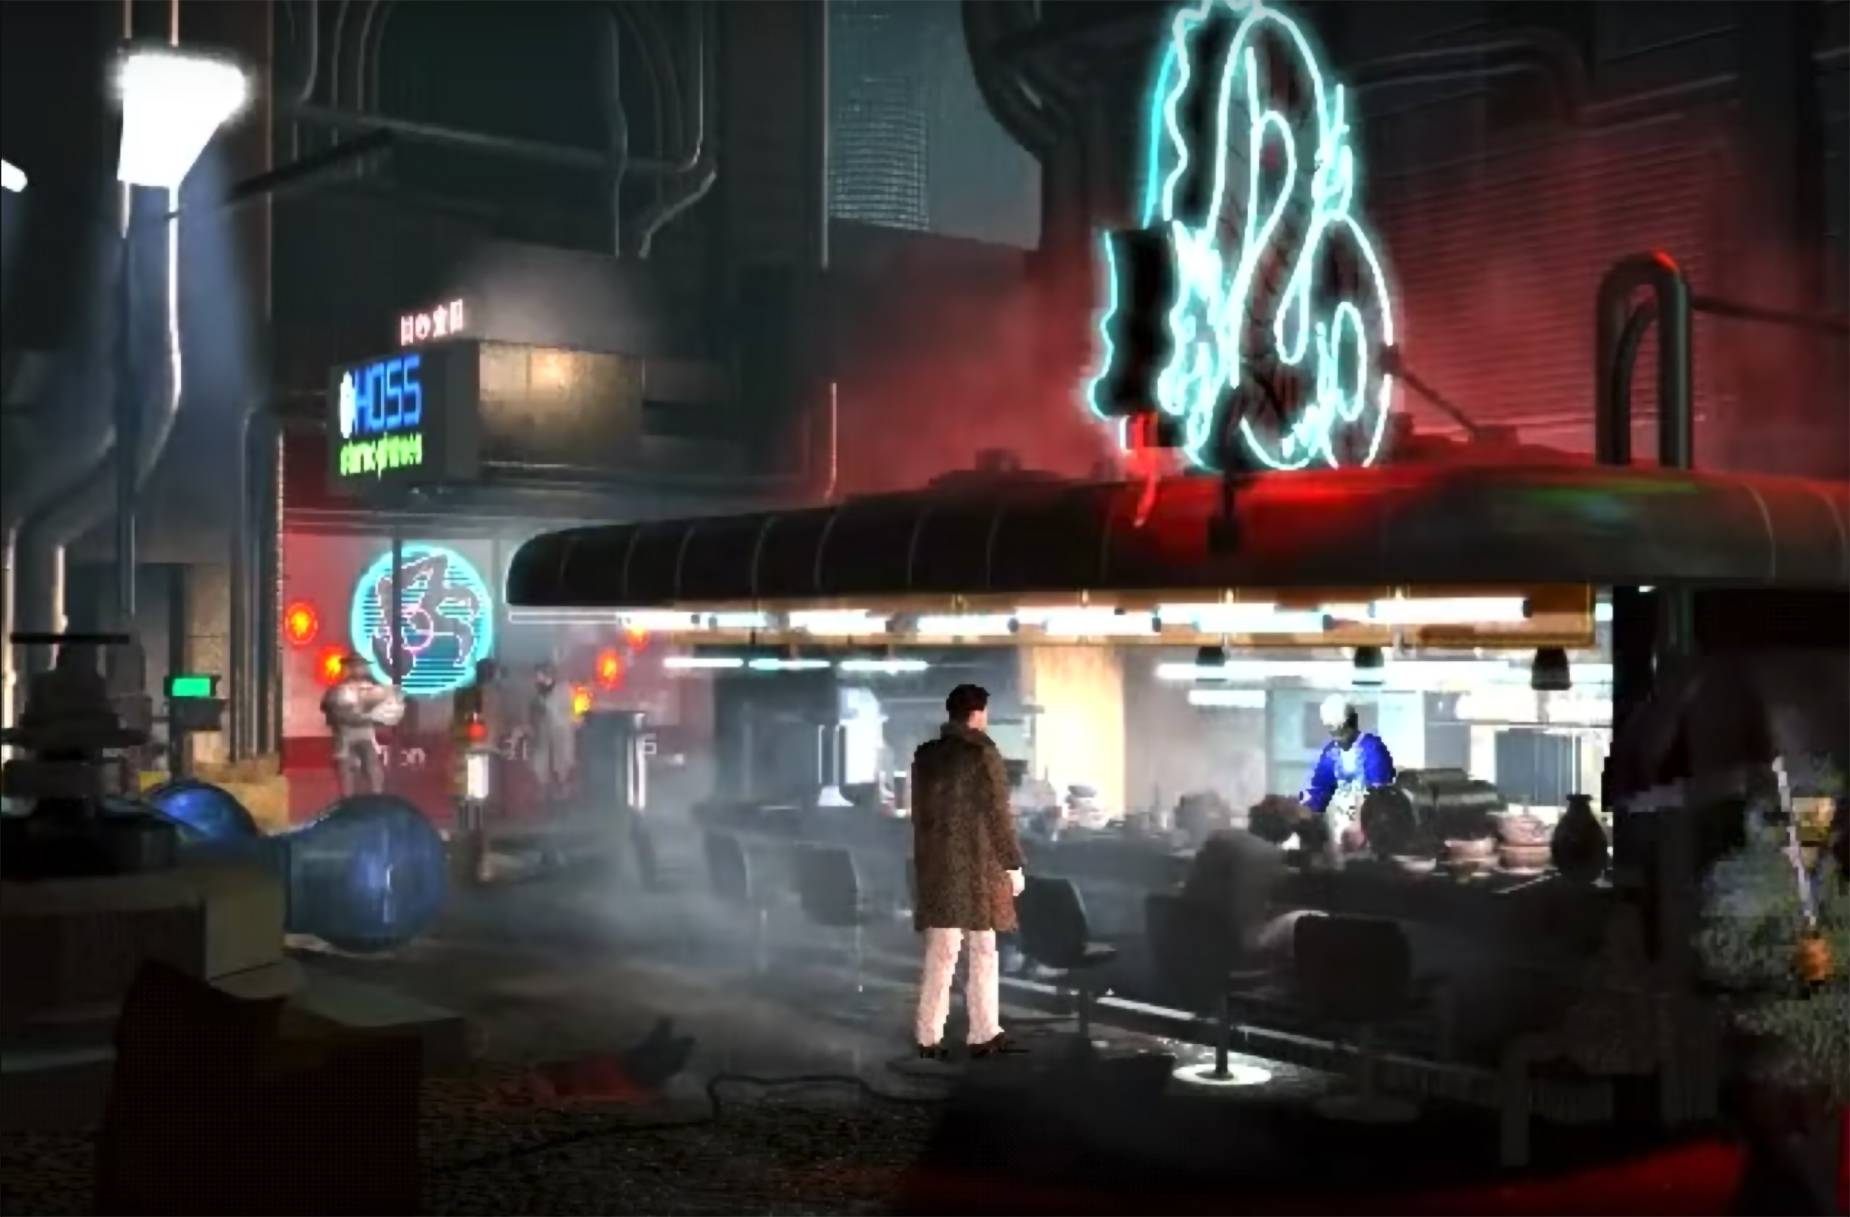 Blade Runner juego